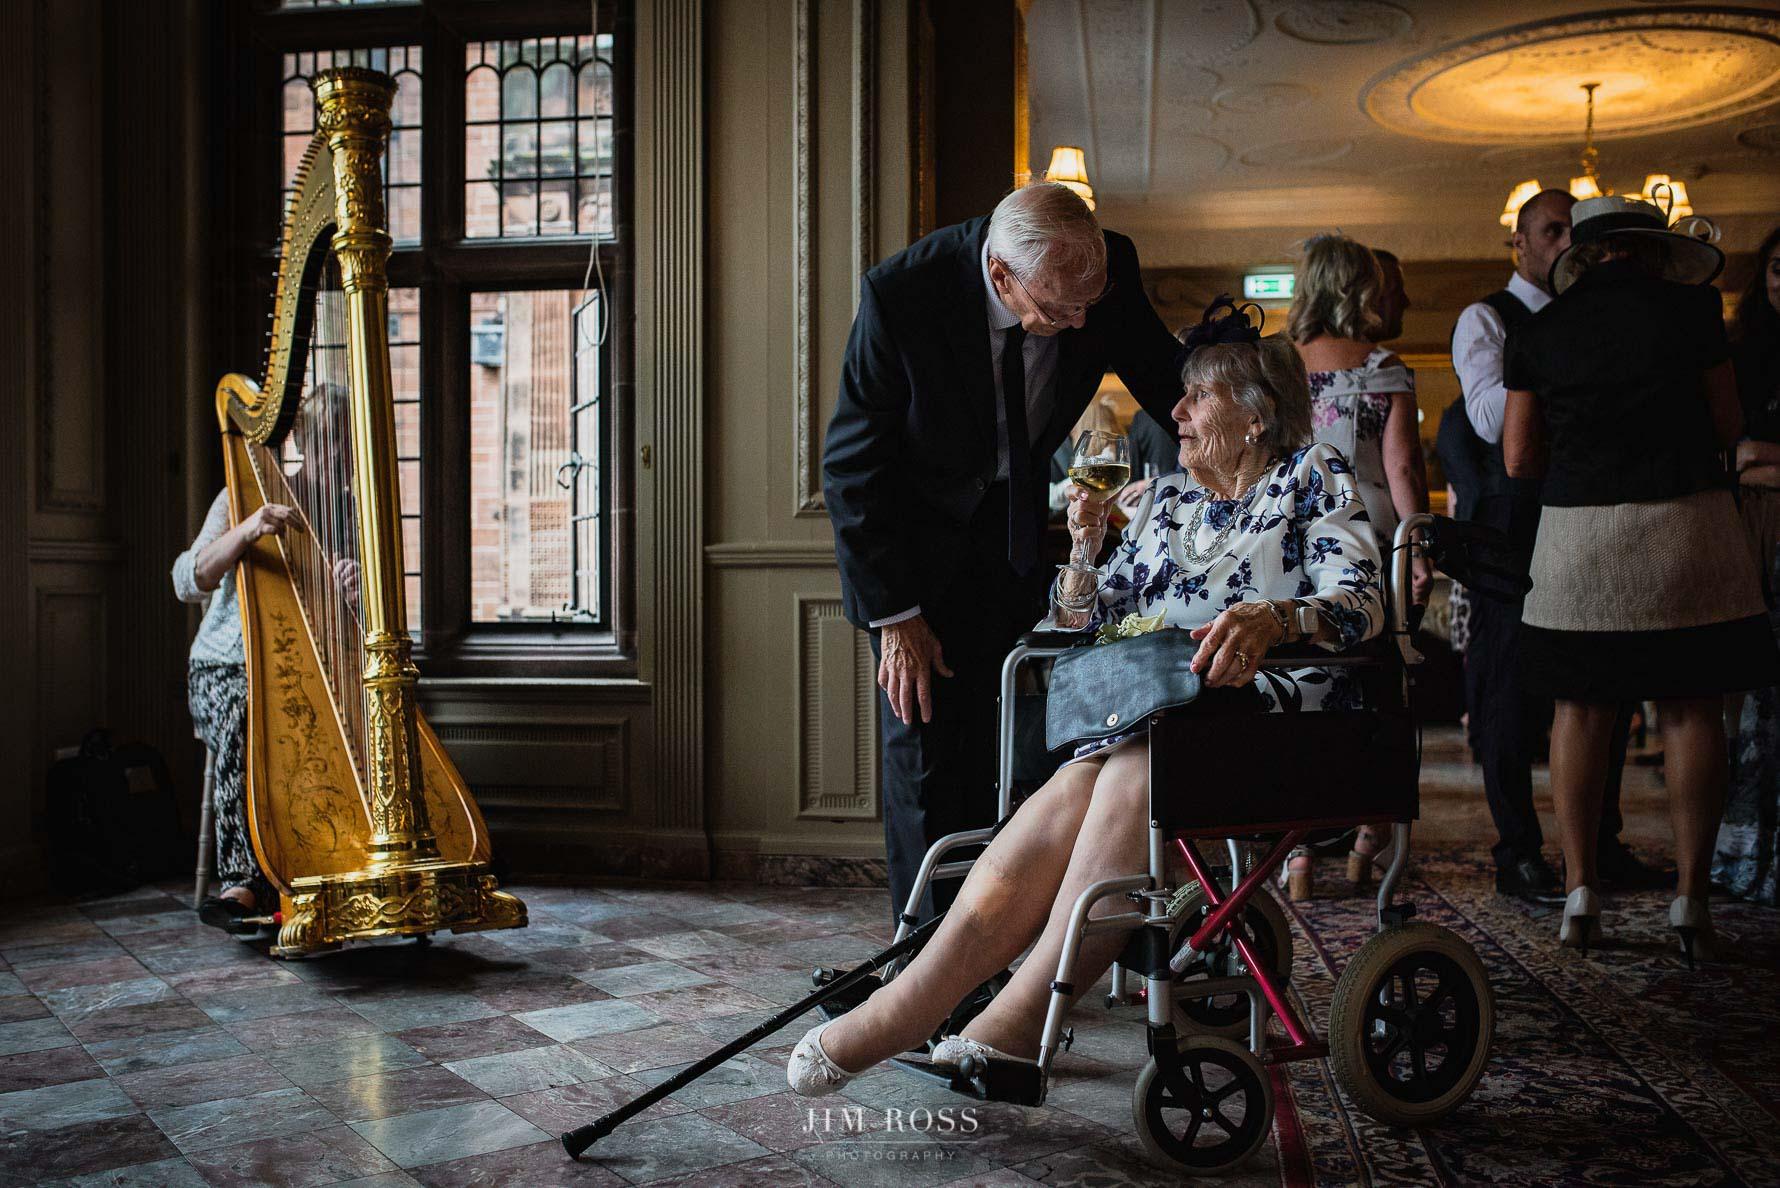 Harpist entertains in grand room